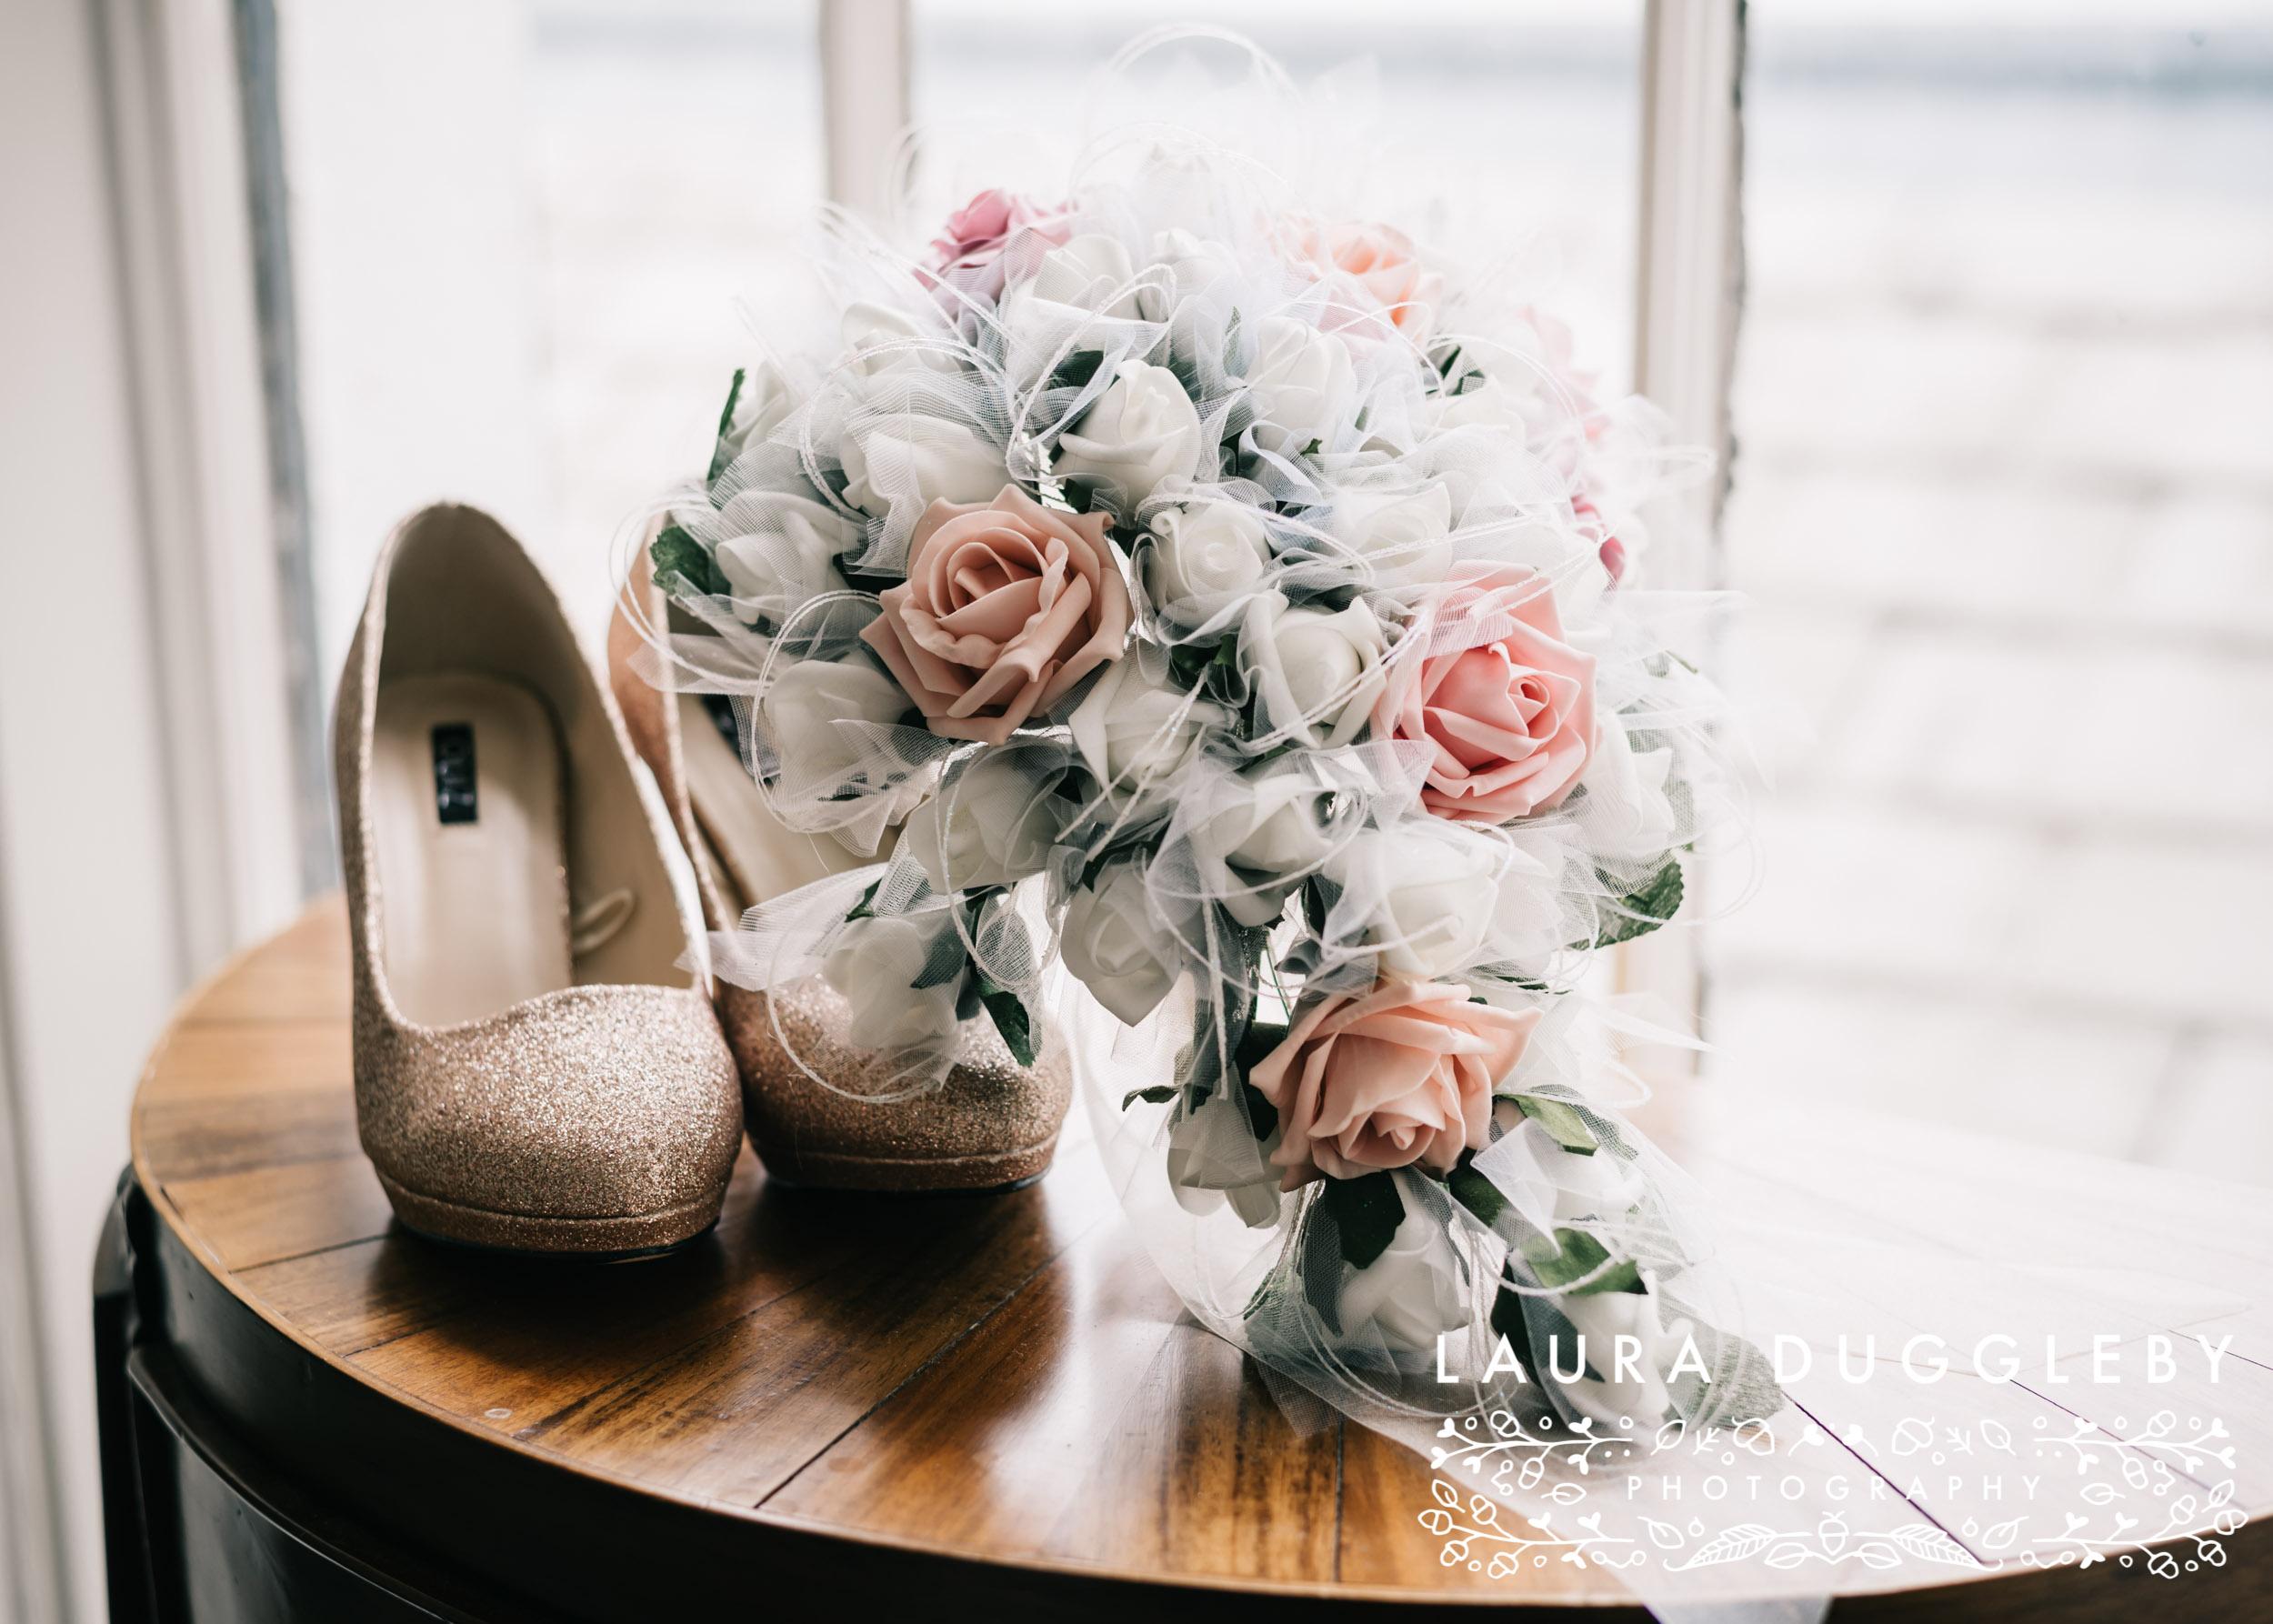 Accrington Wedding Photographer - Sparth House Hotel6